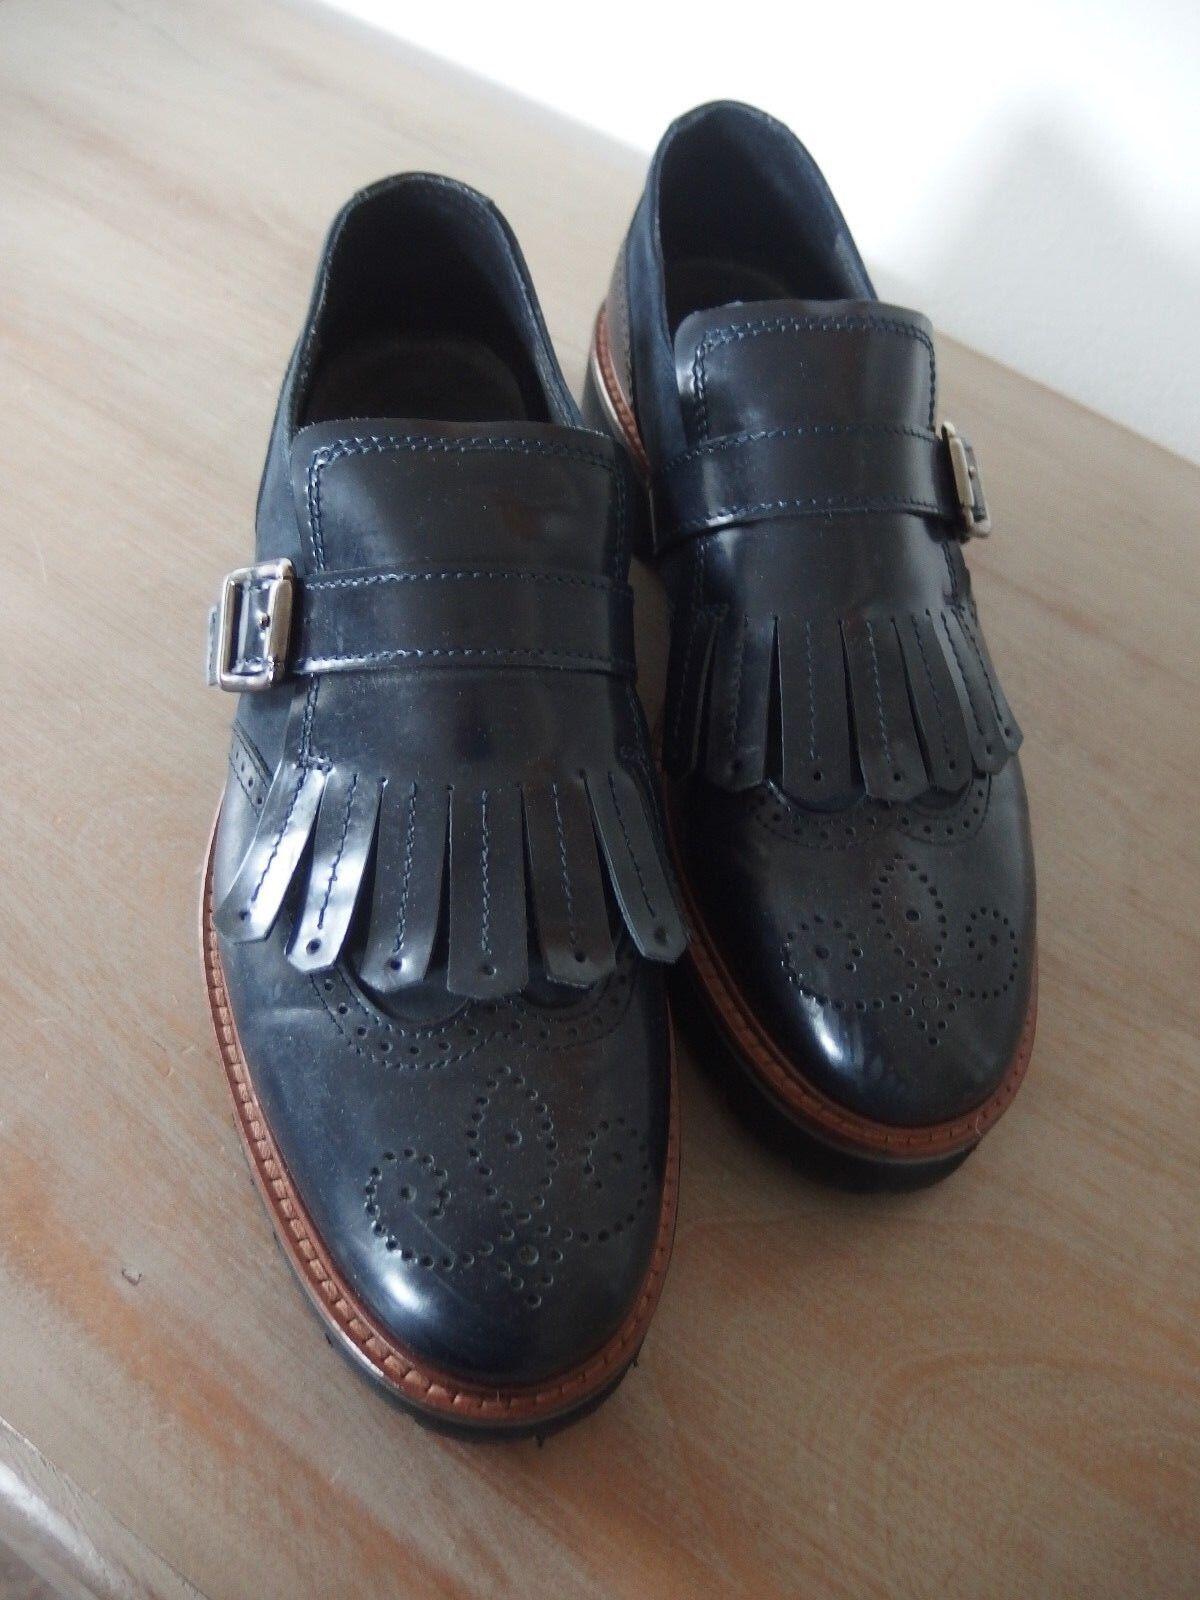 Maripé Damen Schuhe 38,5 Slipper Halbschuh Gr. 38,5 Schuhe blau ***neuwertig*** 948adb